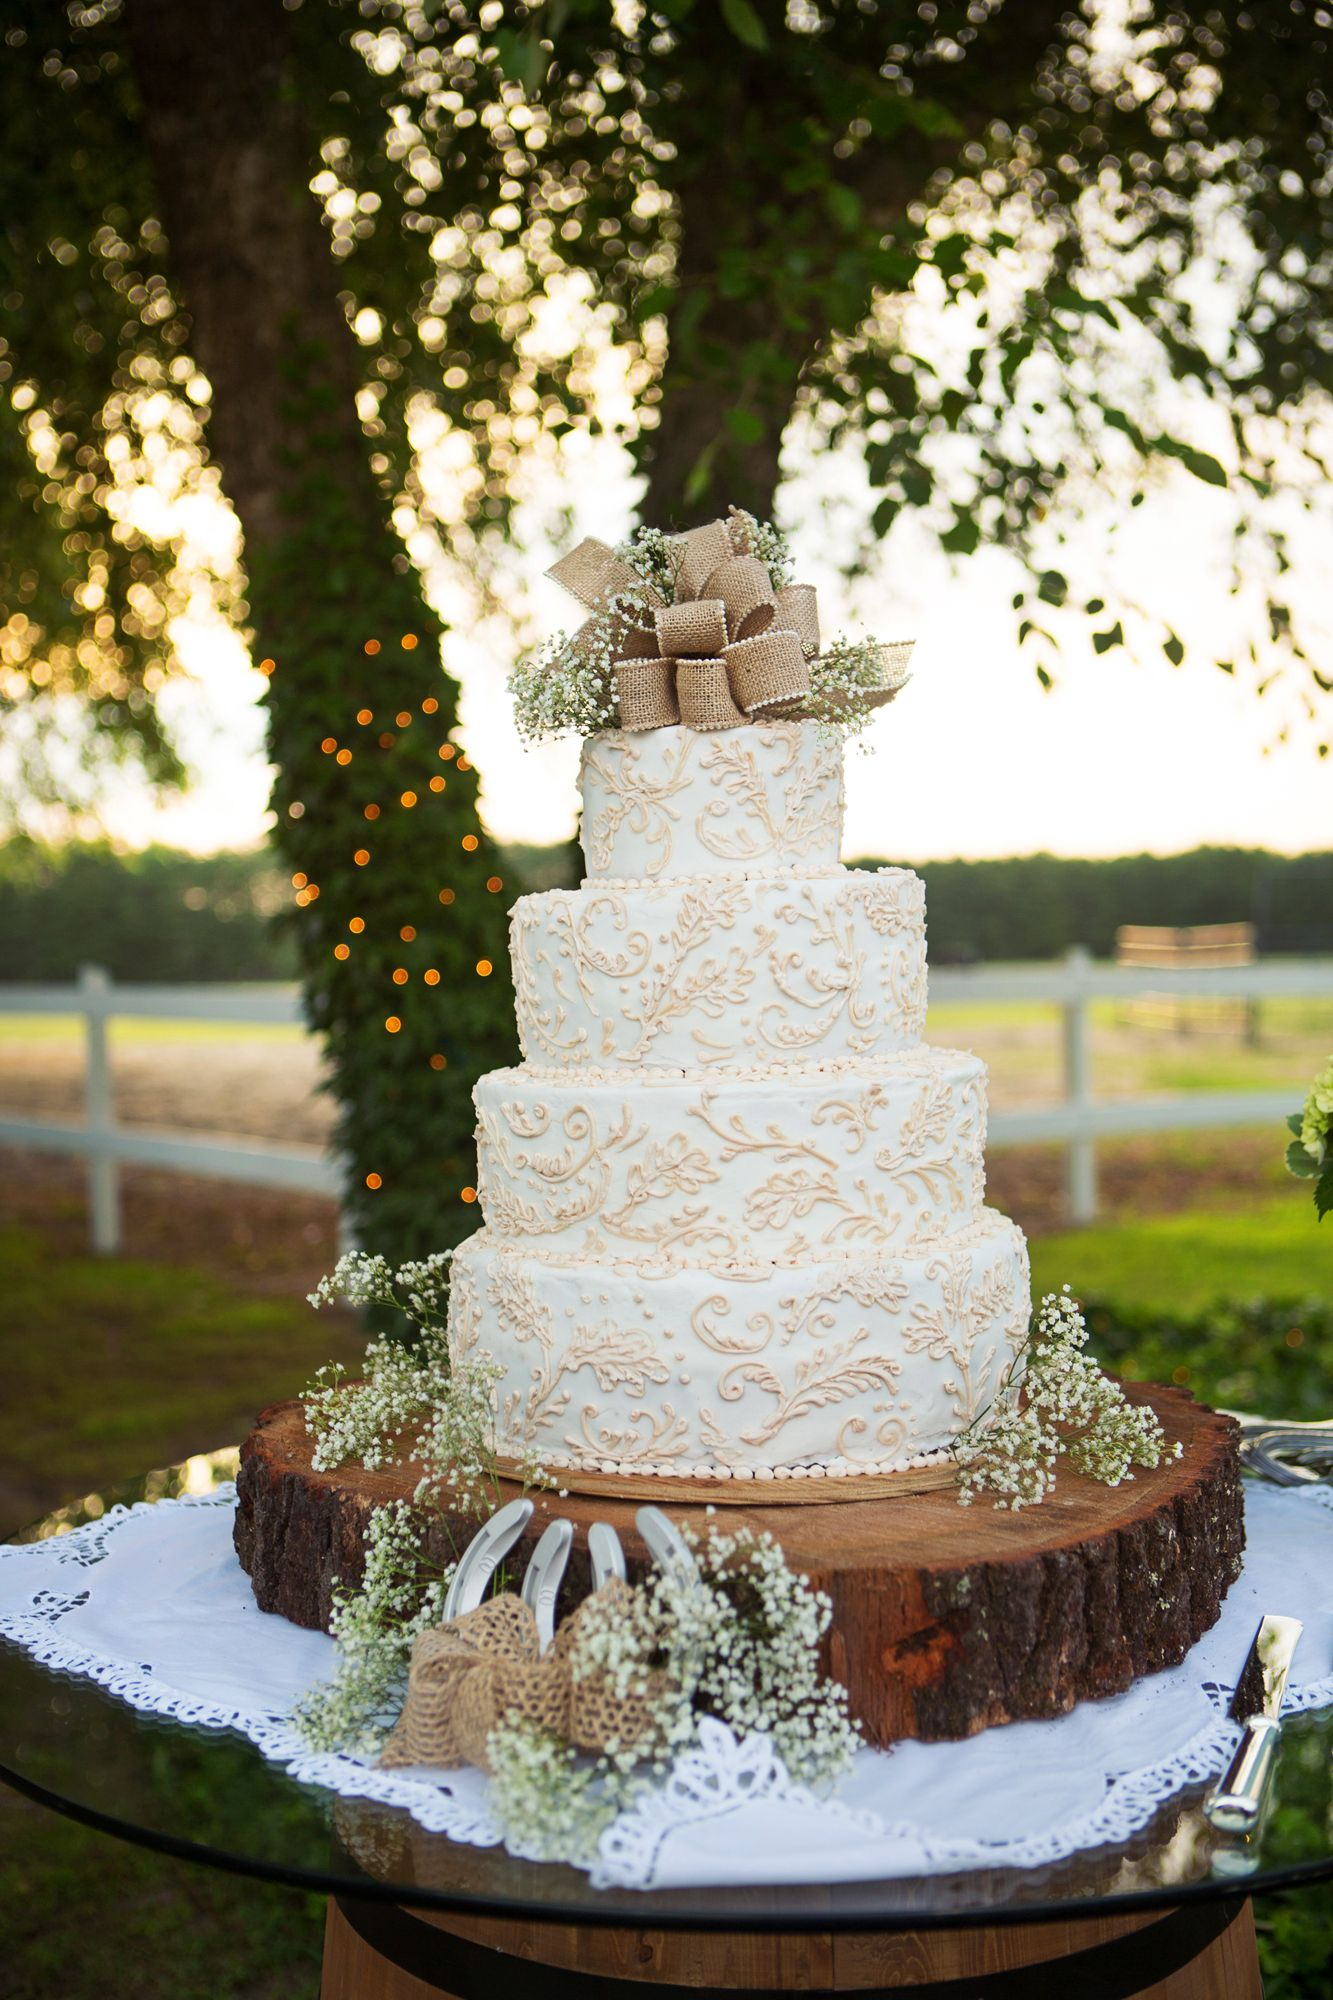 Rustic Burlap And Lace Wedding Cake Wedding Cake Rustic Country Wedding Cakes Lace Wedding Cake